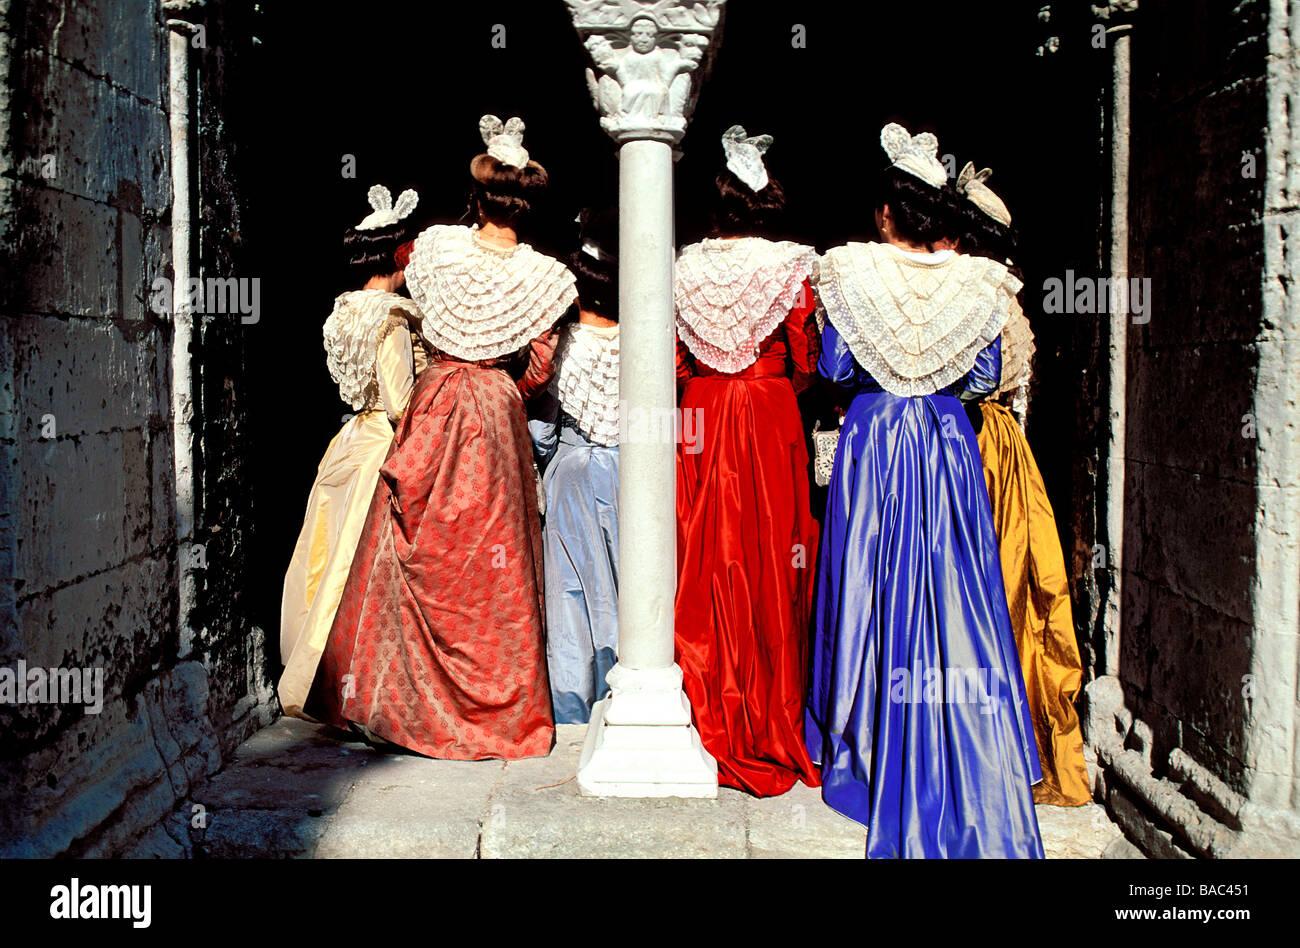 france bouches du rhone camargue arles costume festival saint stock photo royalty free. Black Bedroom Furniture Sets. Home Design Ideas